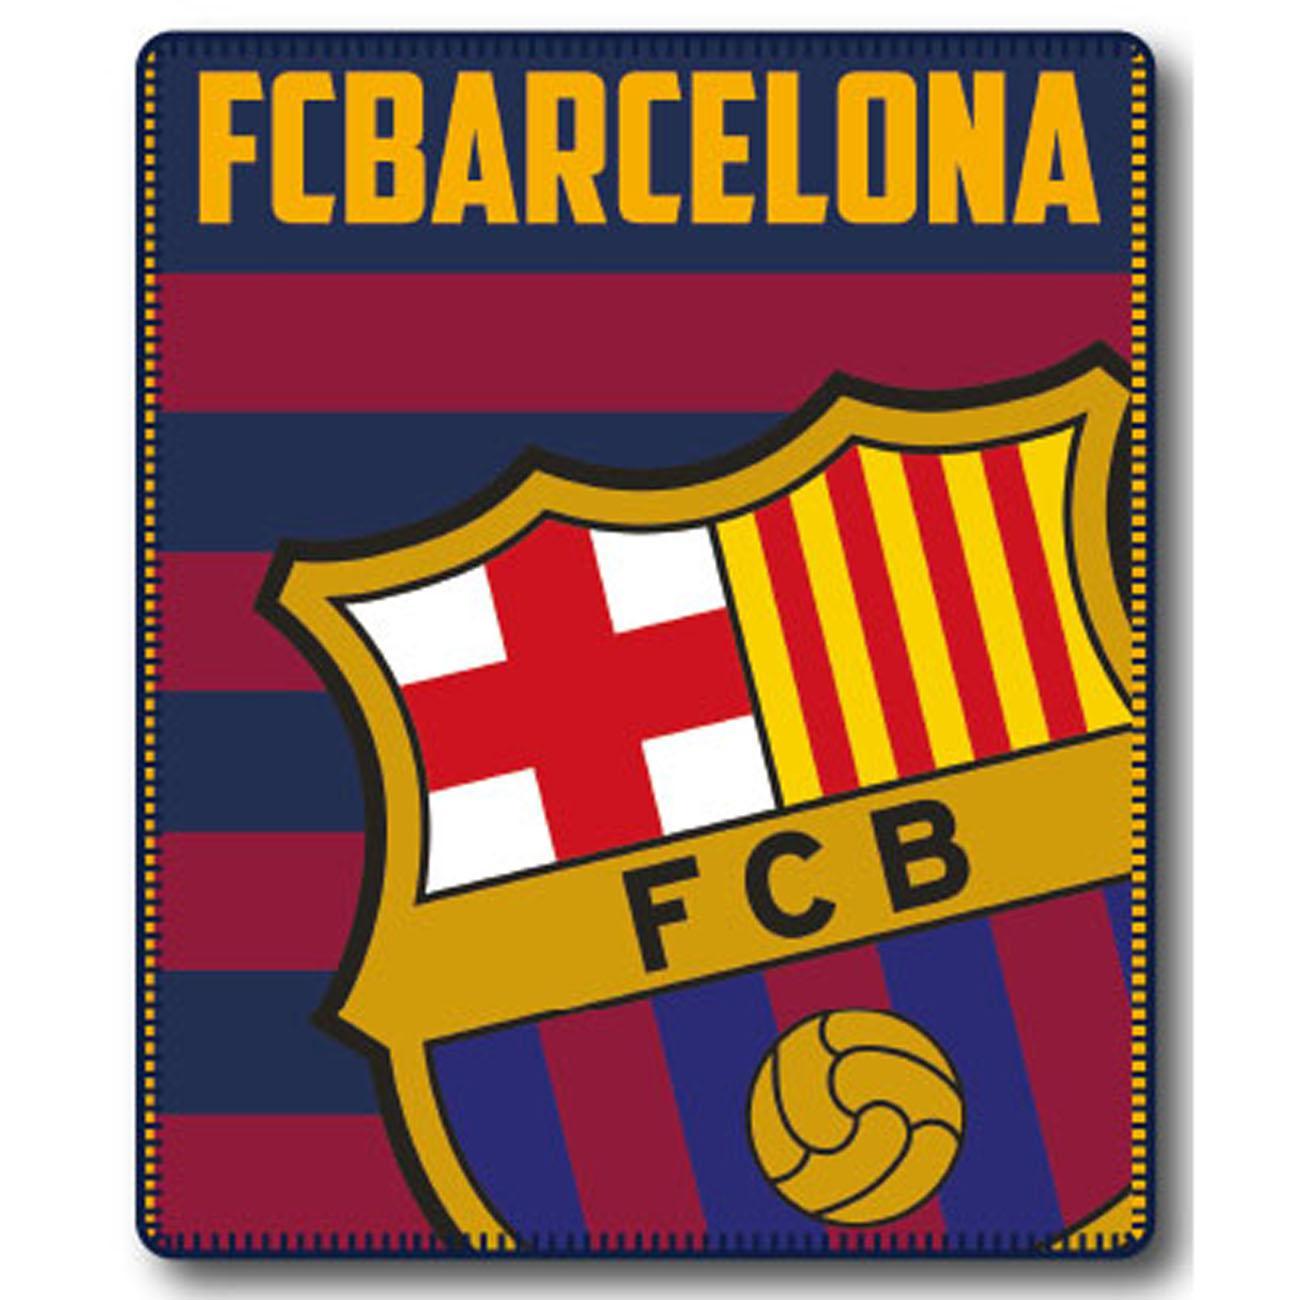 Manta Plaid Escudo Fc Barcelona Complementos